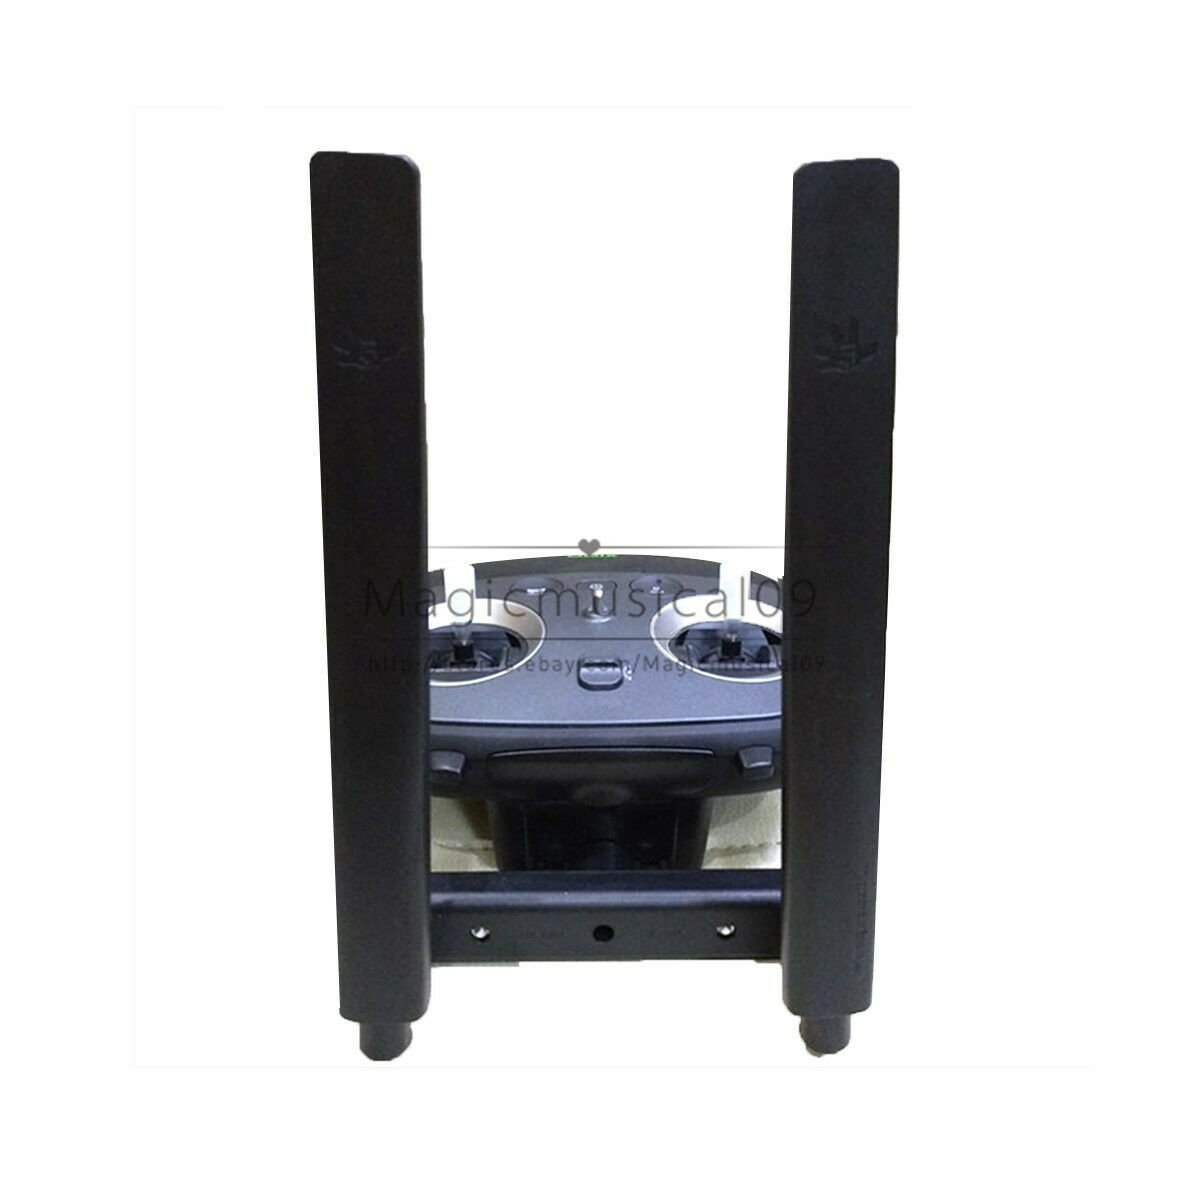 XIRO-ZERO-Explorer Signal Booster Extended Range Signal Booster for Controller